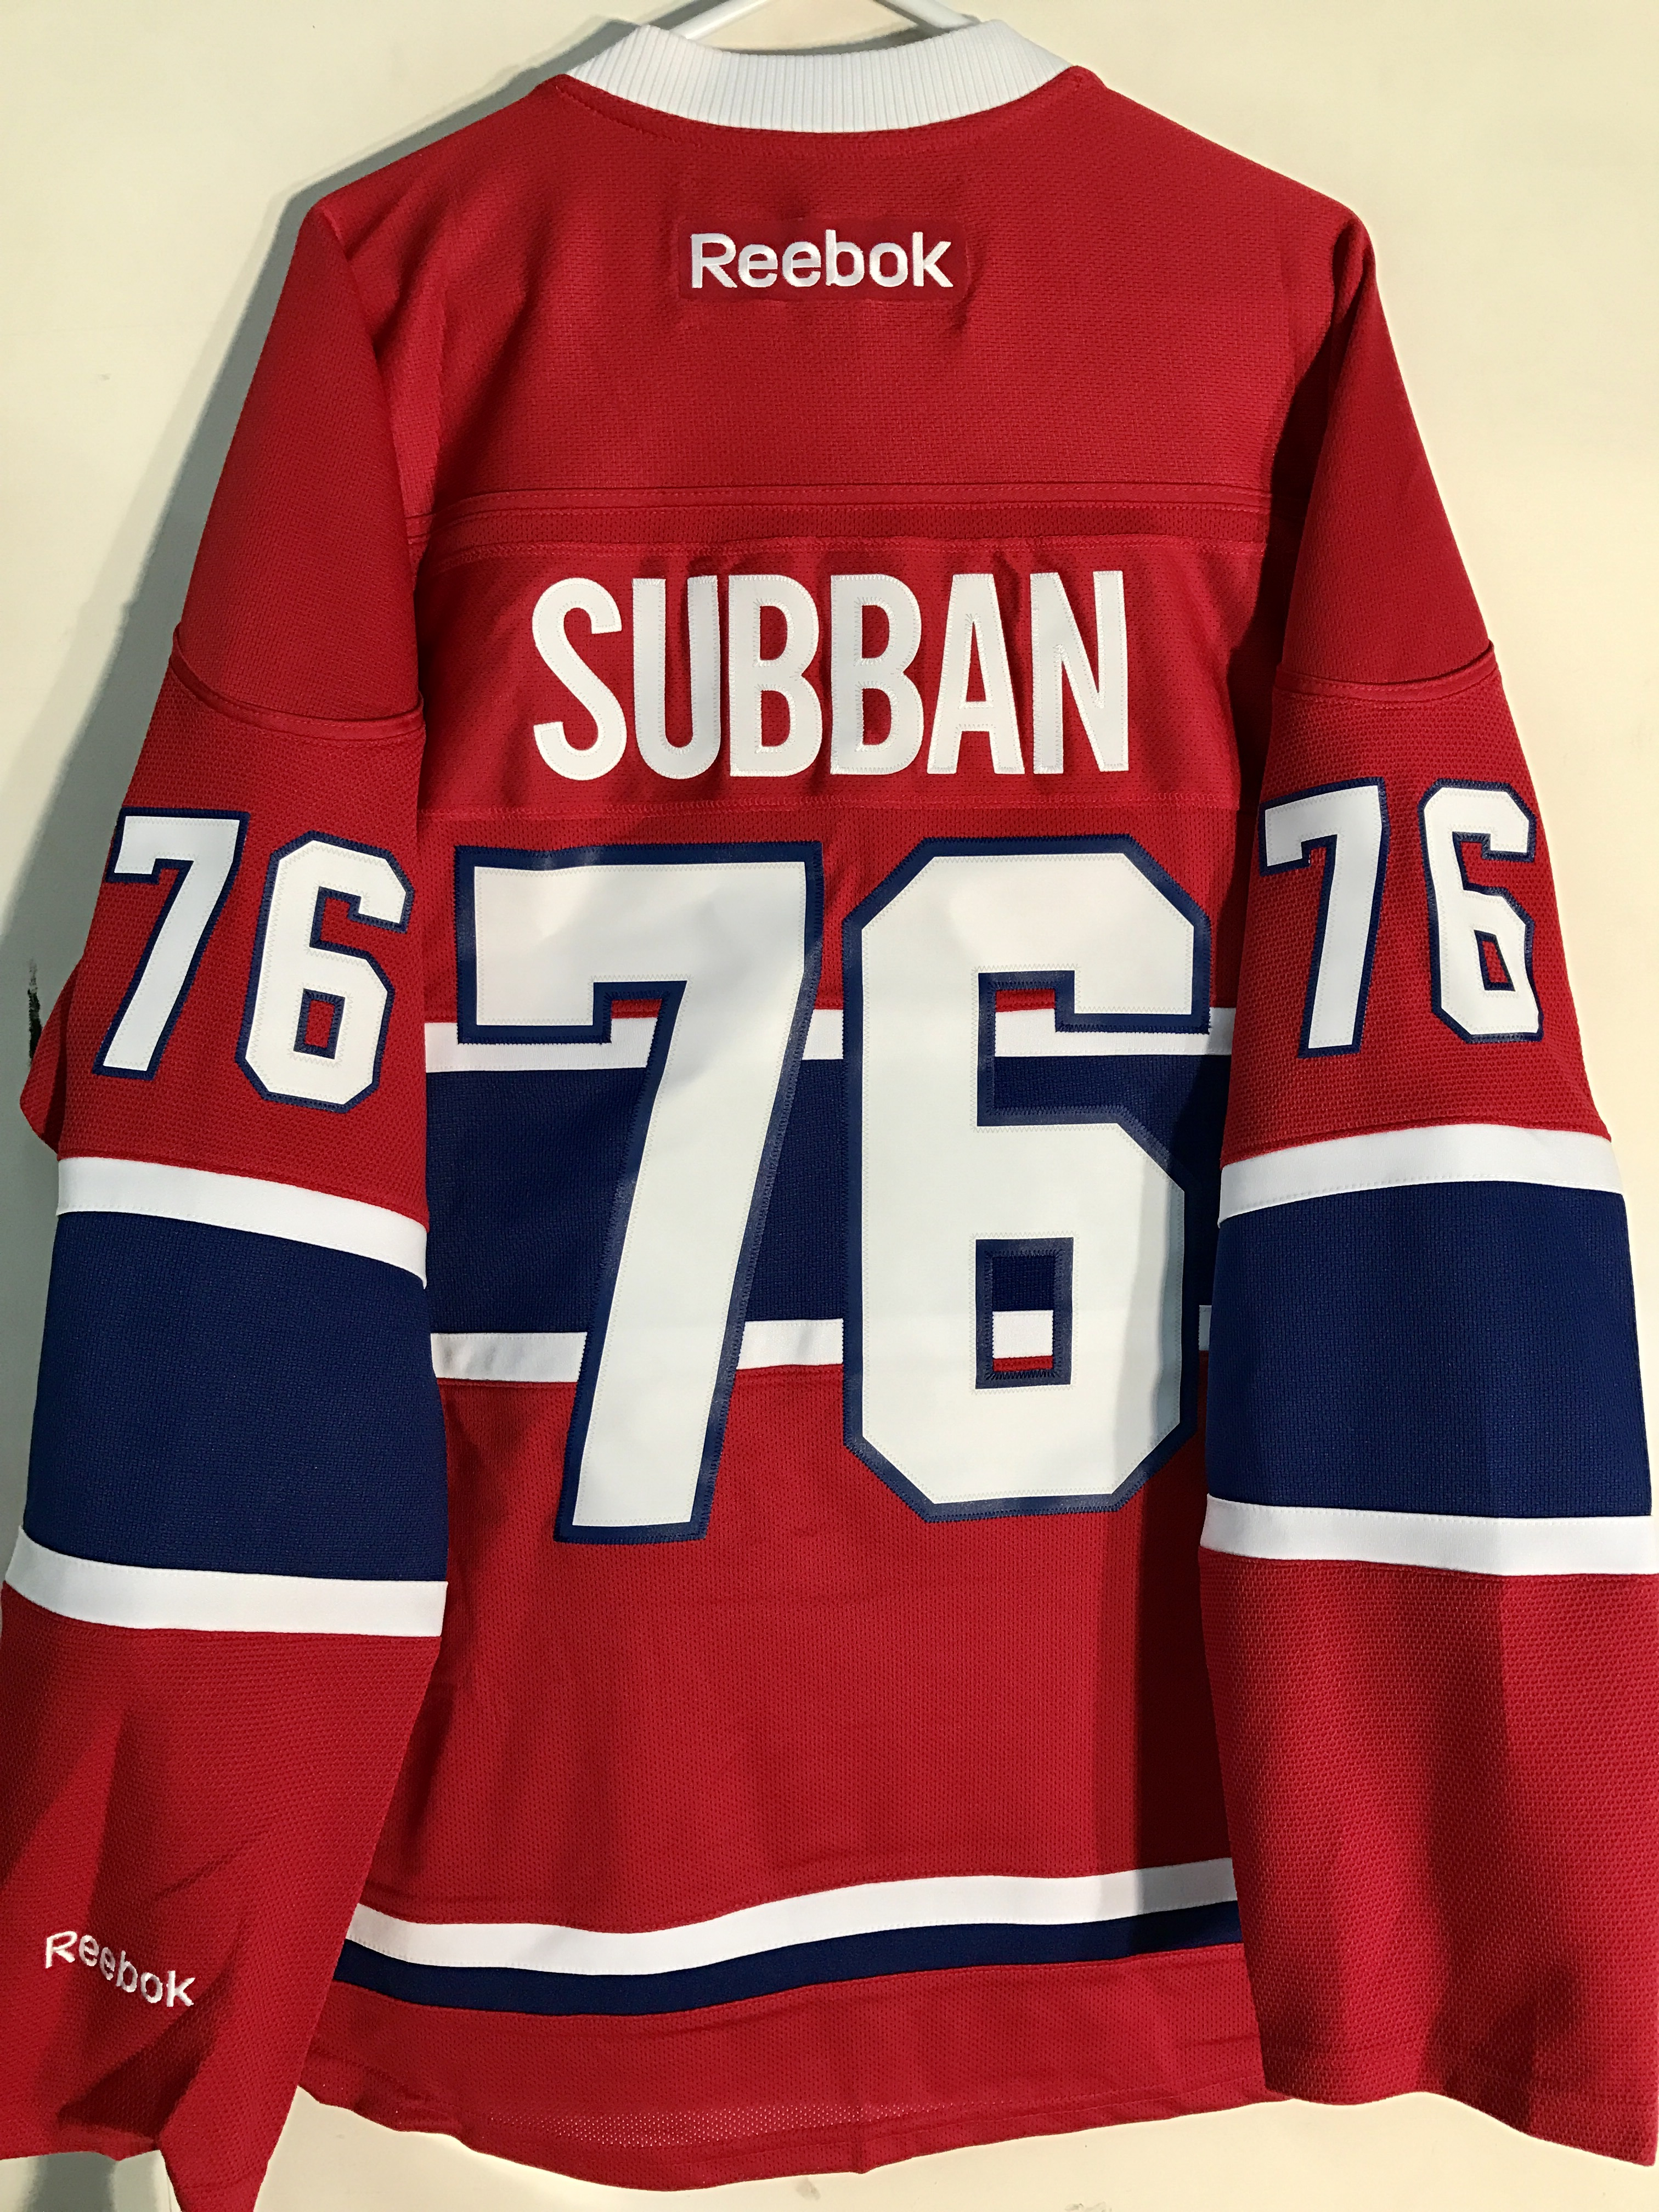 Reebok Premier NHL Jersey Montreal Canadiens P.K. Subban Red sz S  850f279d4